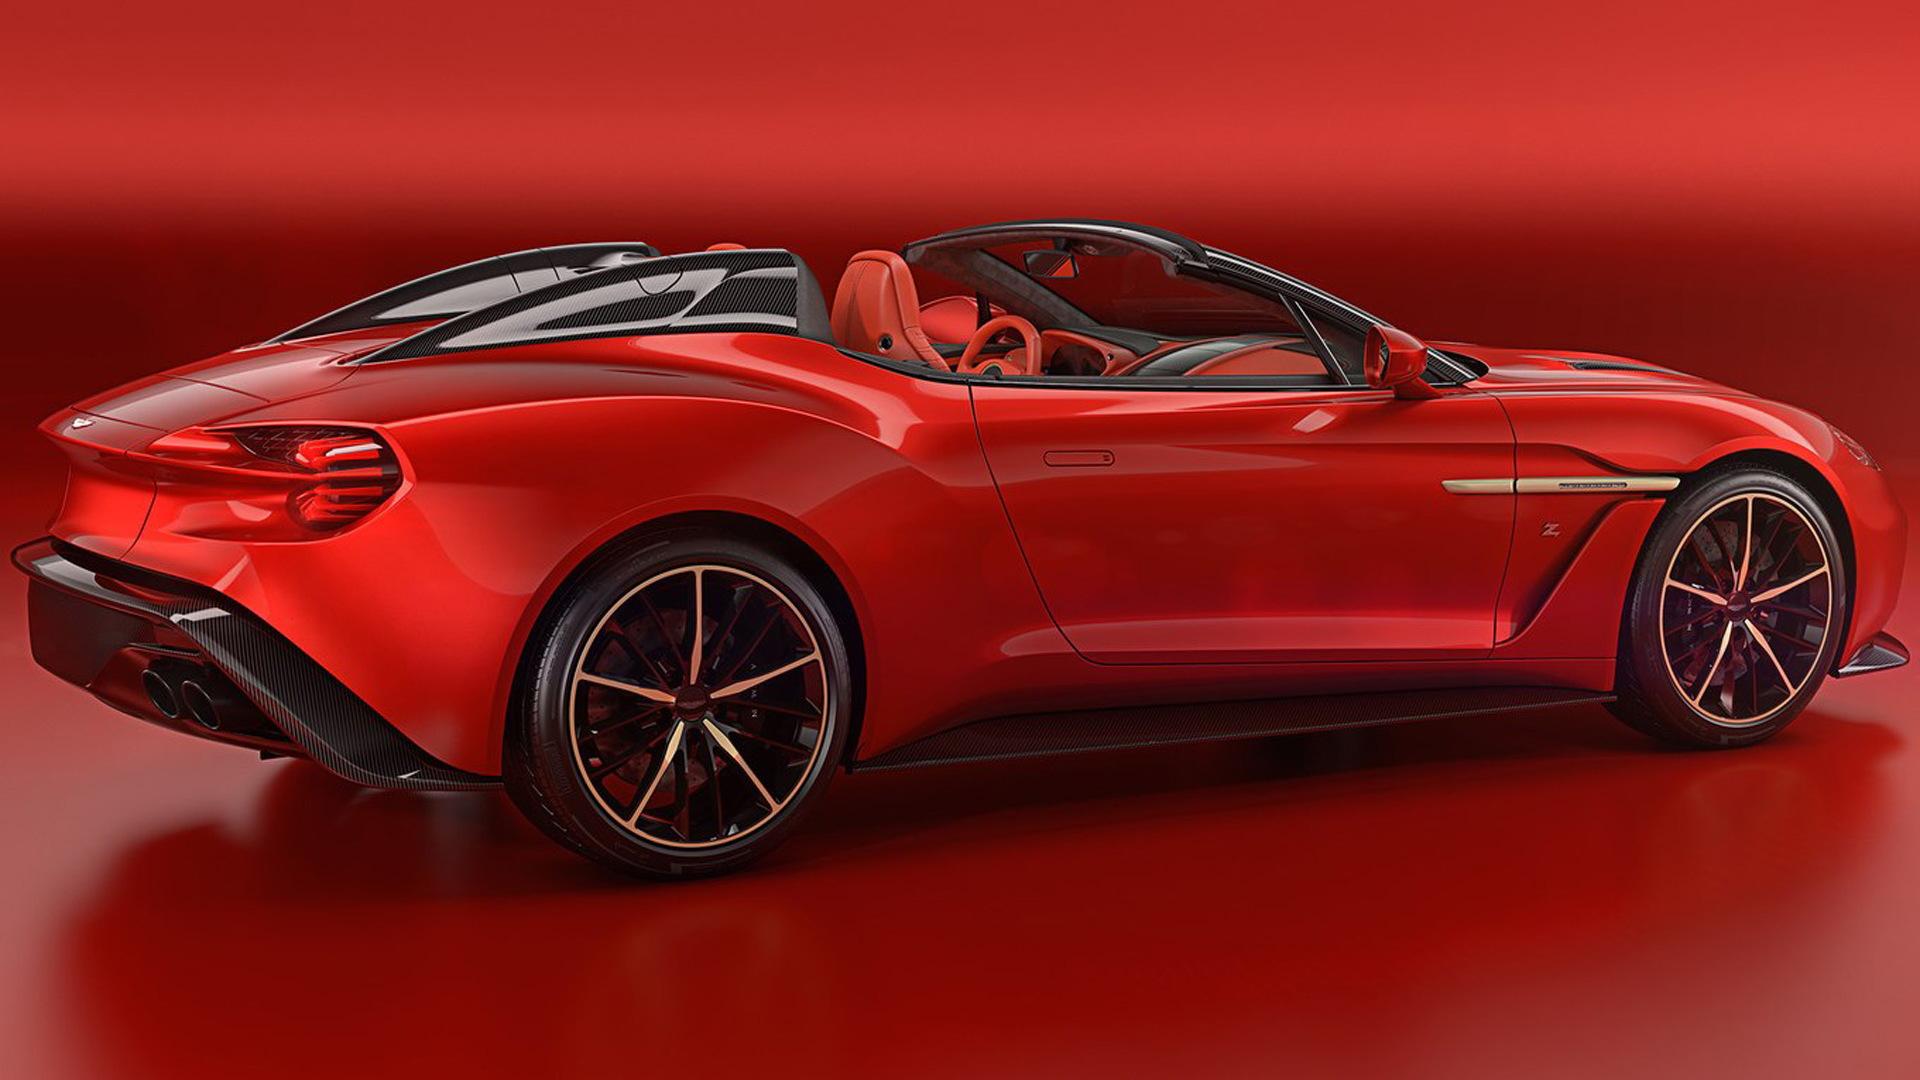 Someone Bought All 4 Aston Martin Vanquish Zagato Body Styles